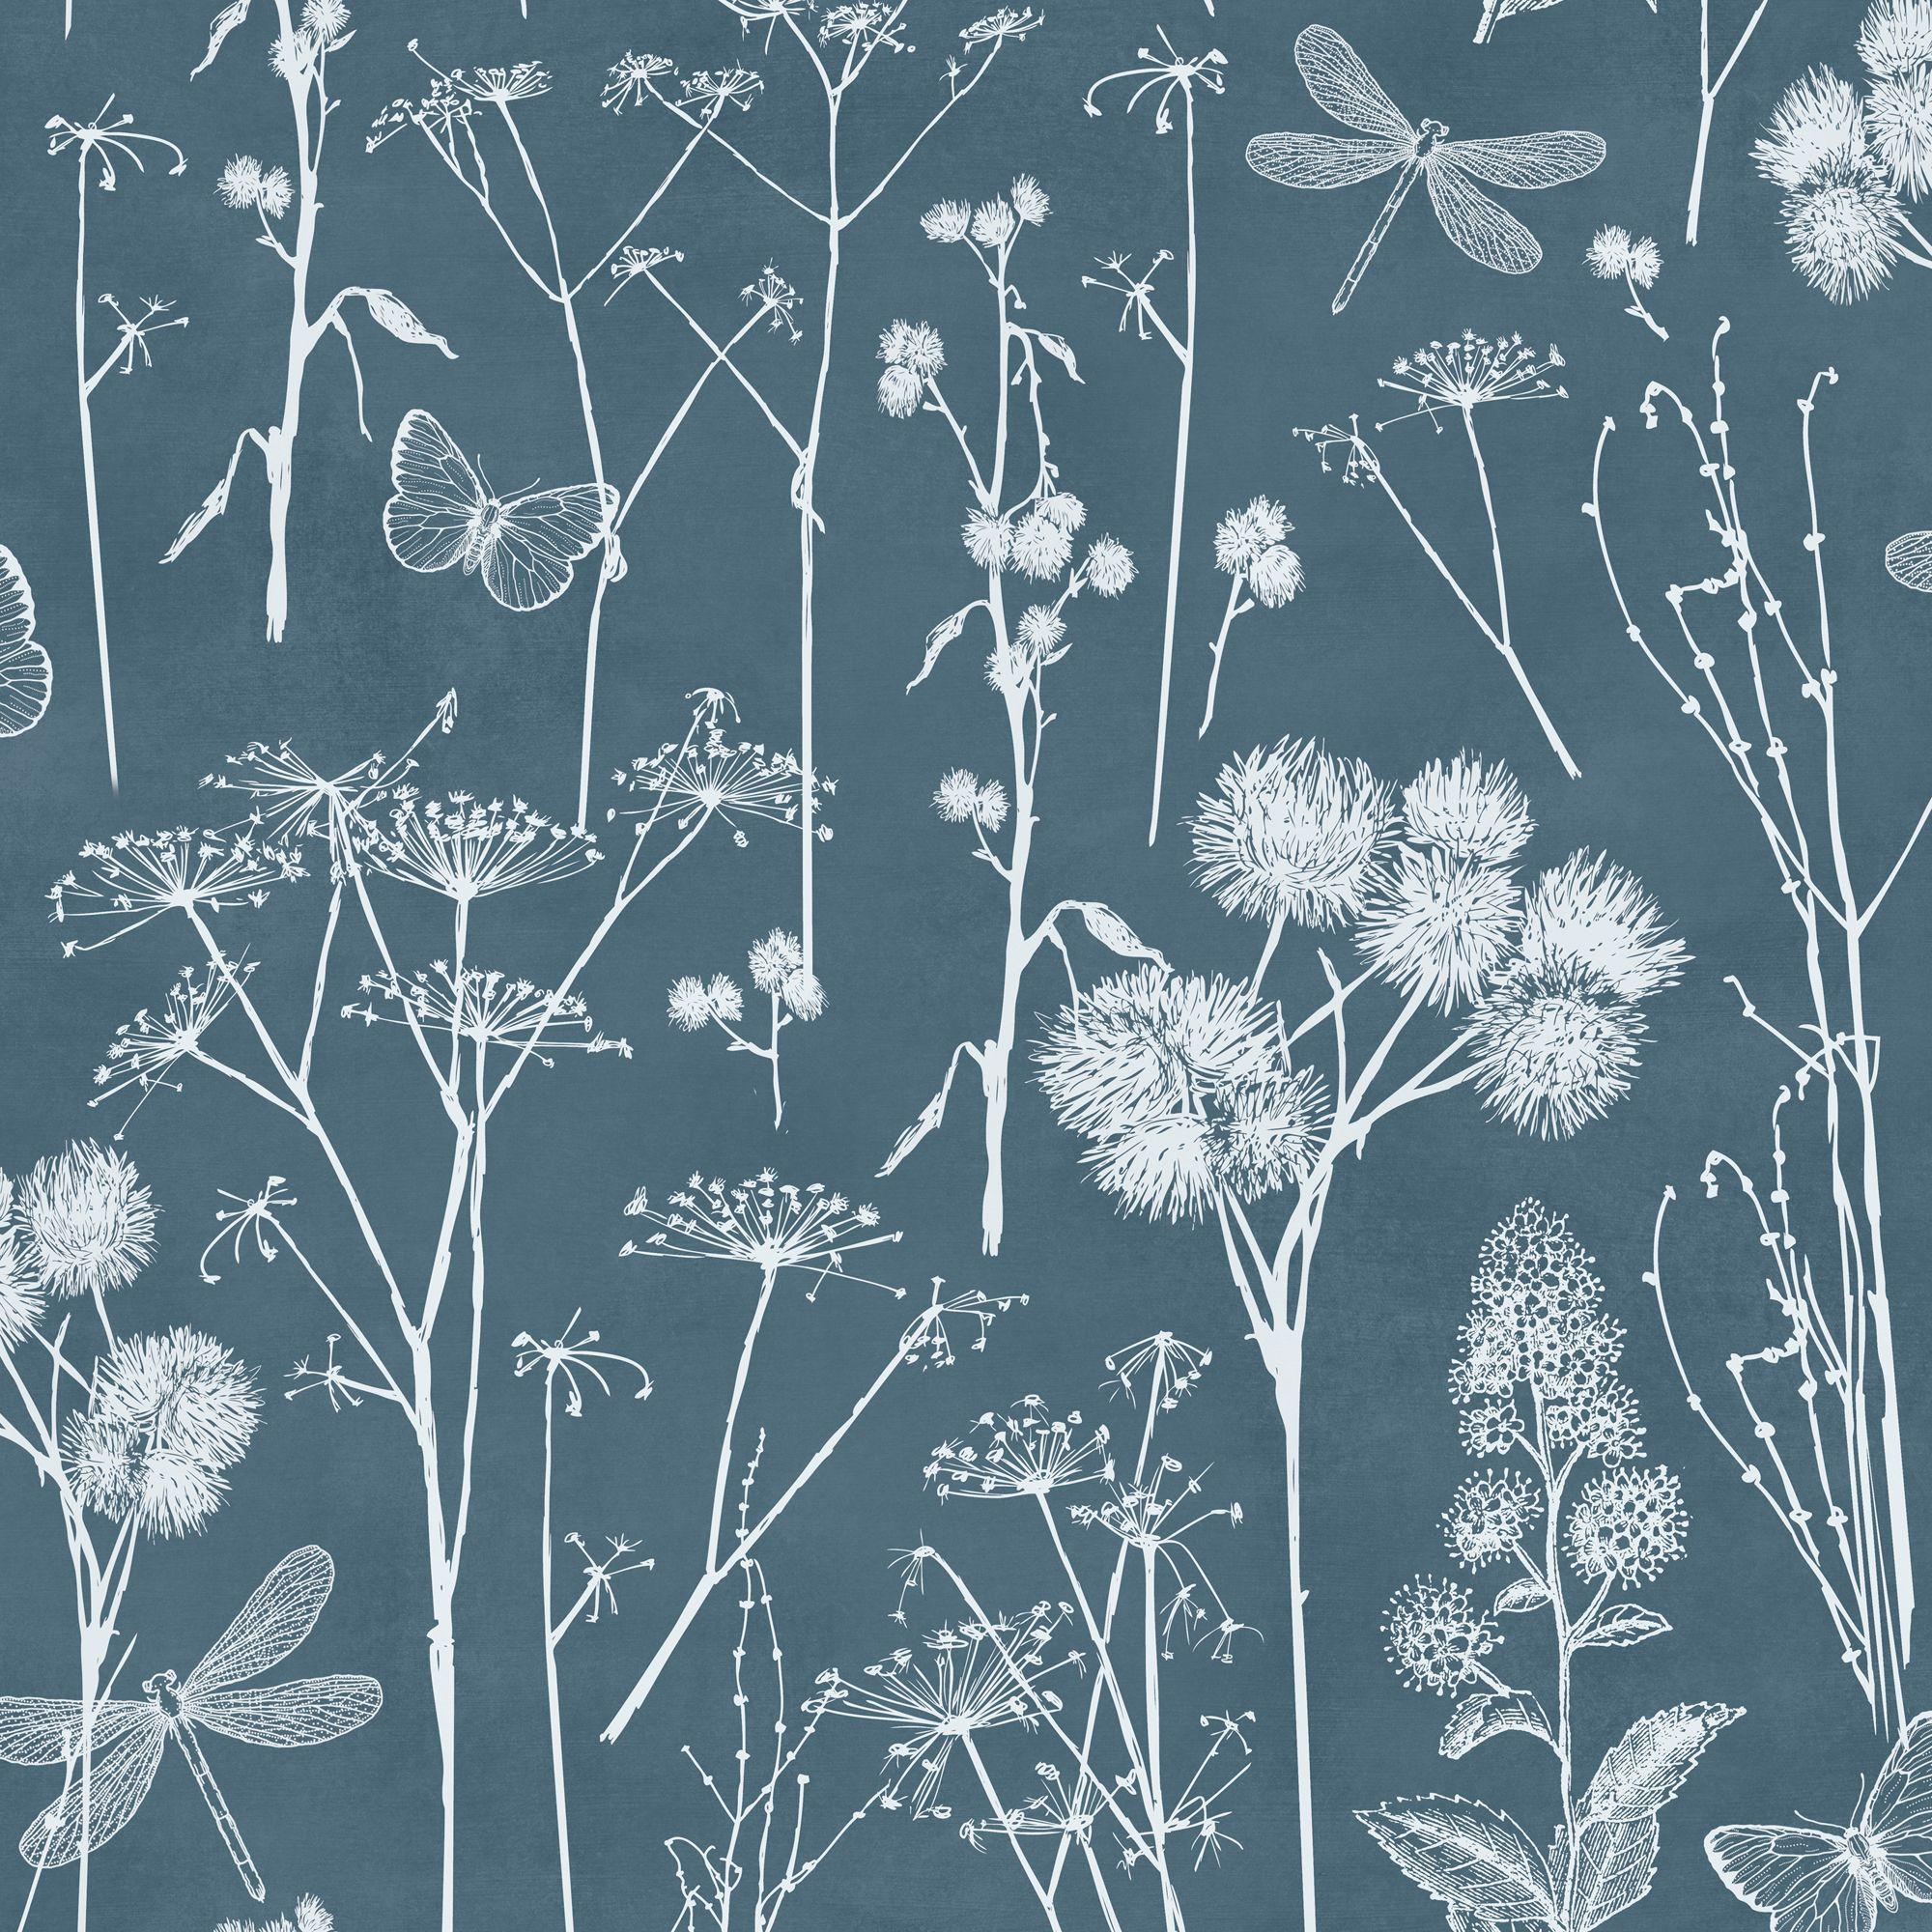 Muriva Botanical Blackboard Teal Foliage Wallpaper